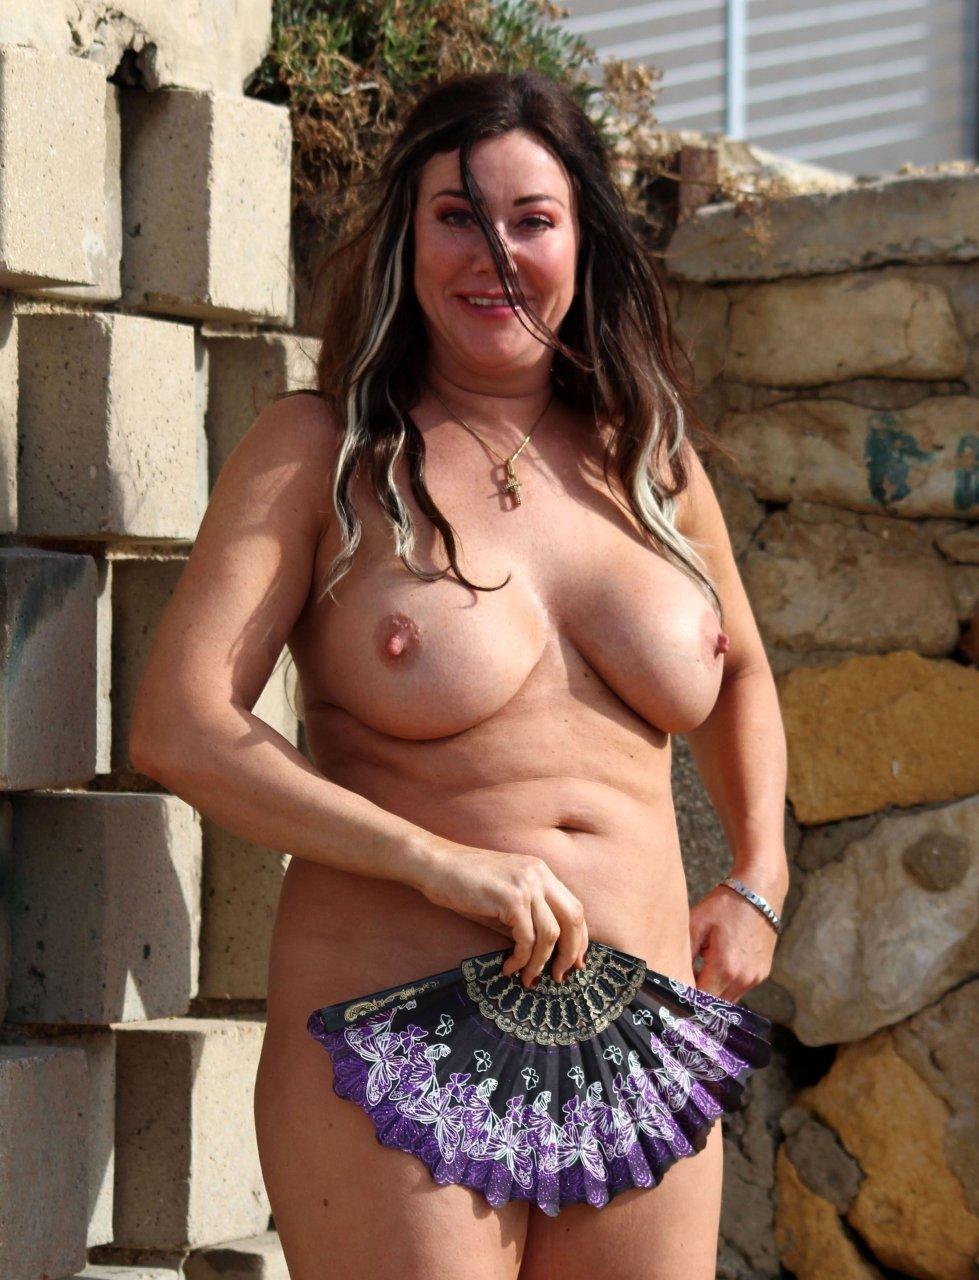 Hot virgin fucking photo